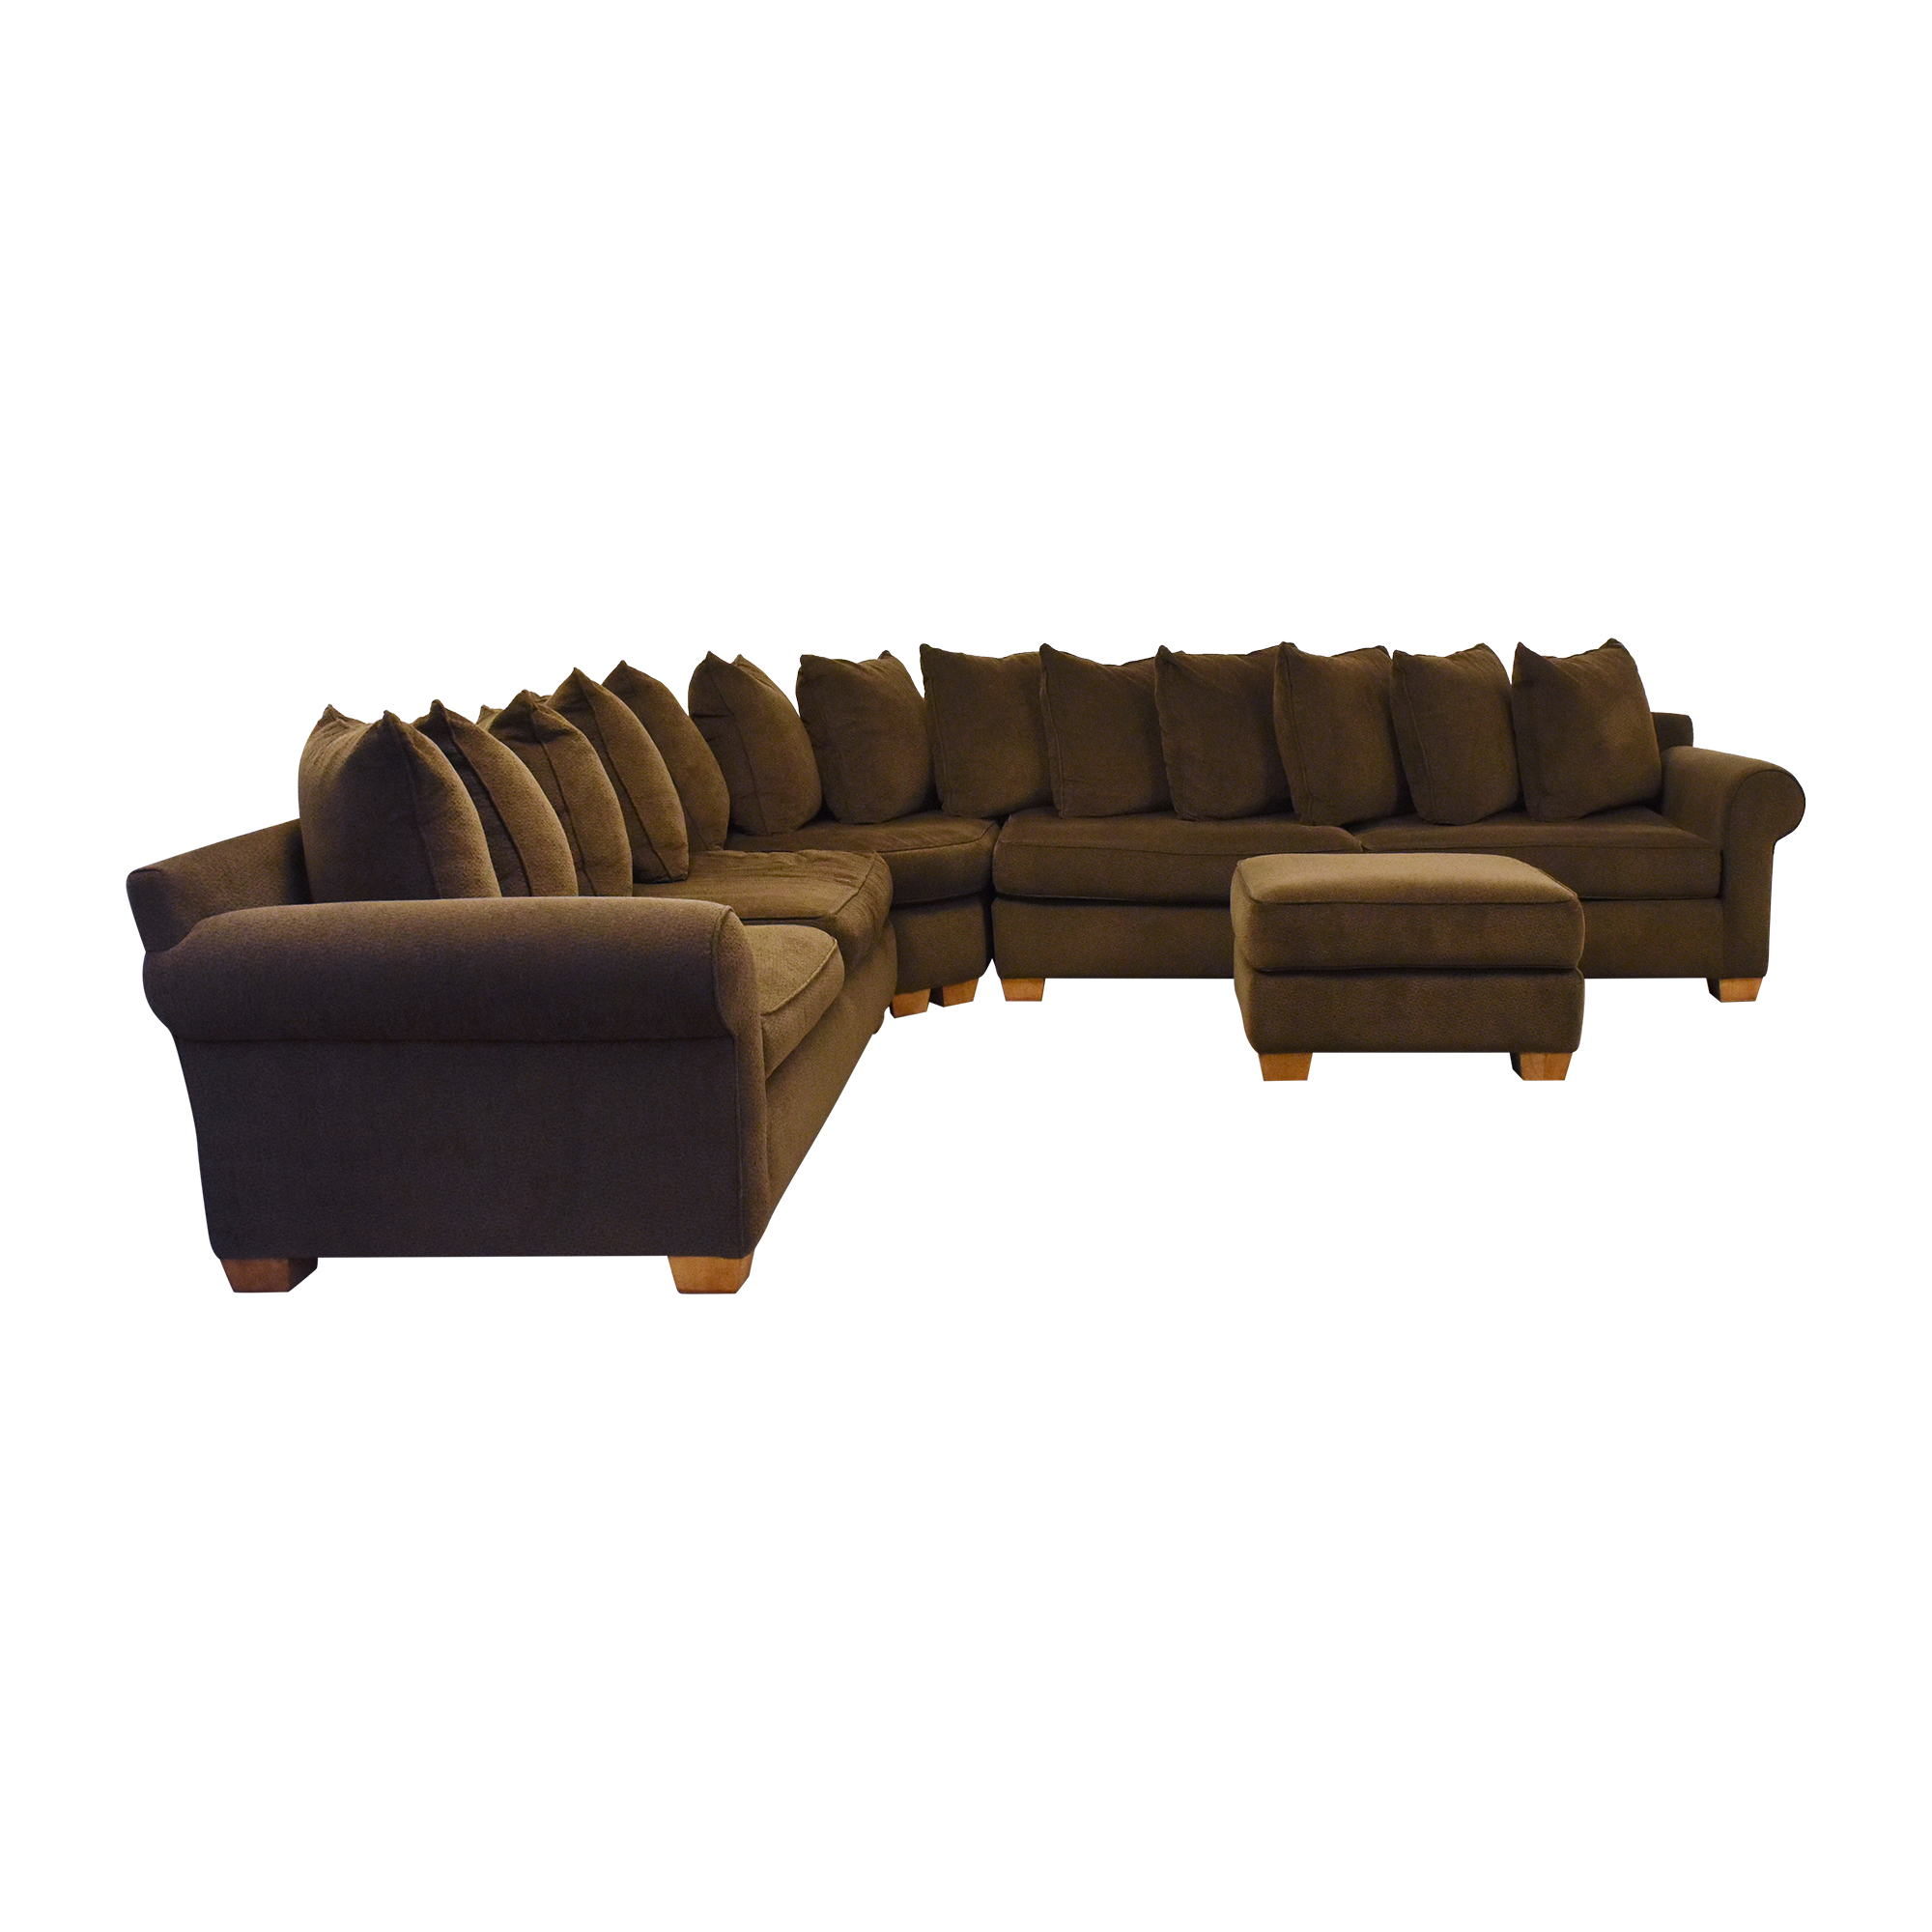 Roche Bobois Roche Bobois Corner Sectional Sofa with Ottoman Sofas